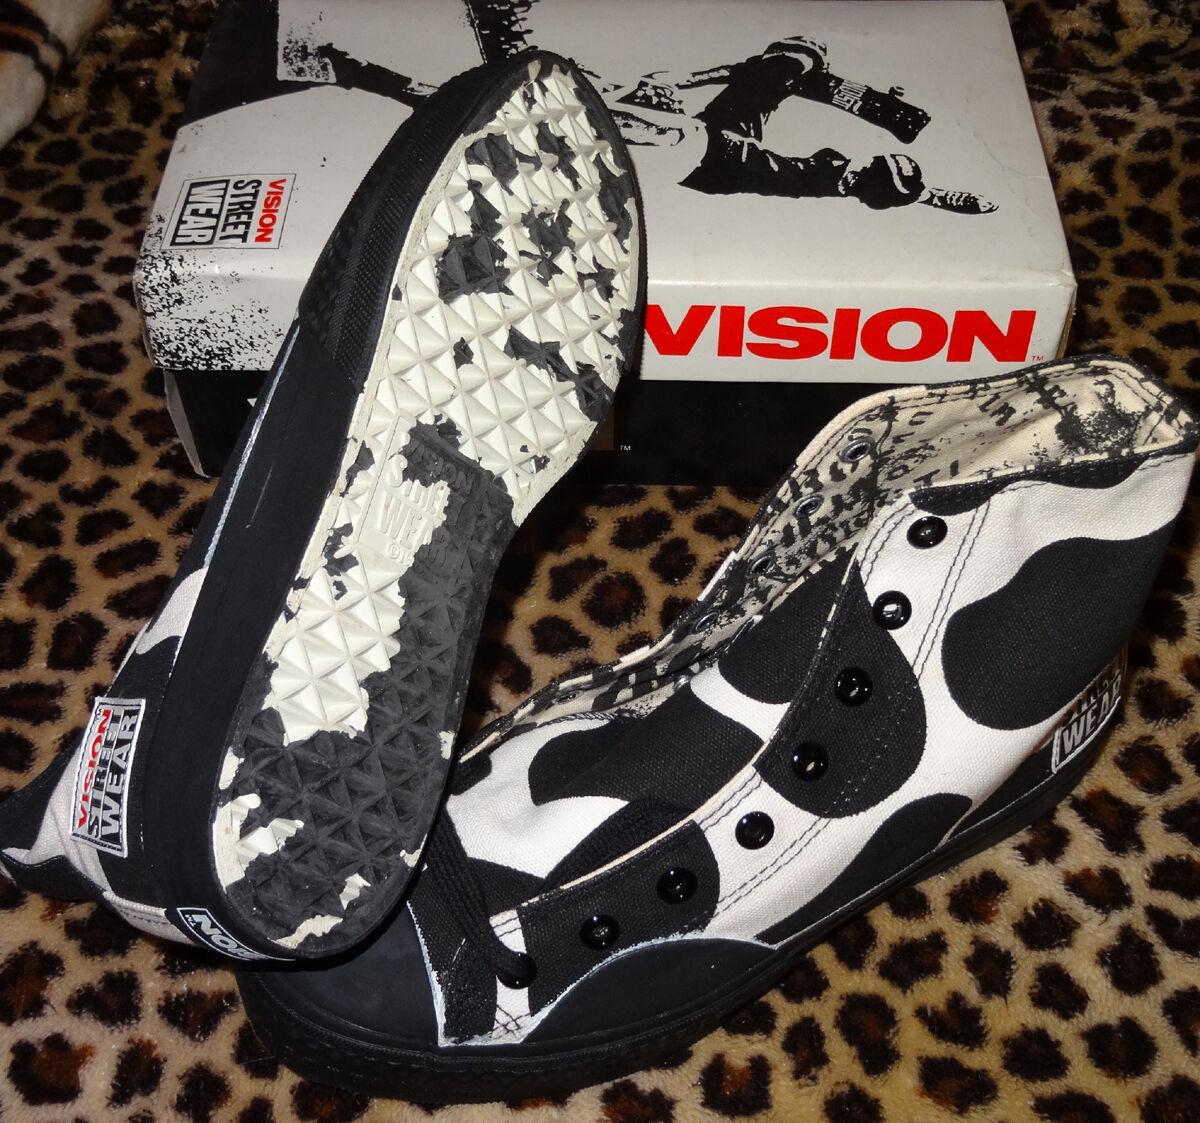 Vision Street Wear Skateboard Schuhe Moo Hi 4 UK/5 USB '80s Jahre Blte Schule